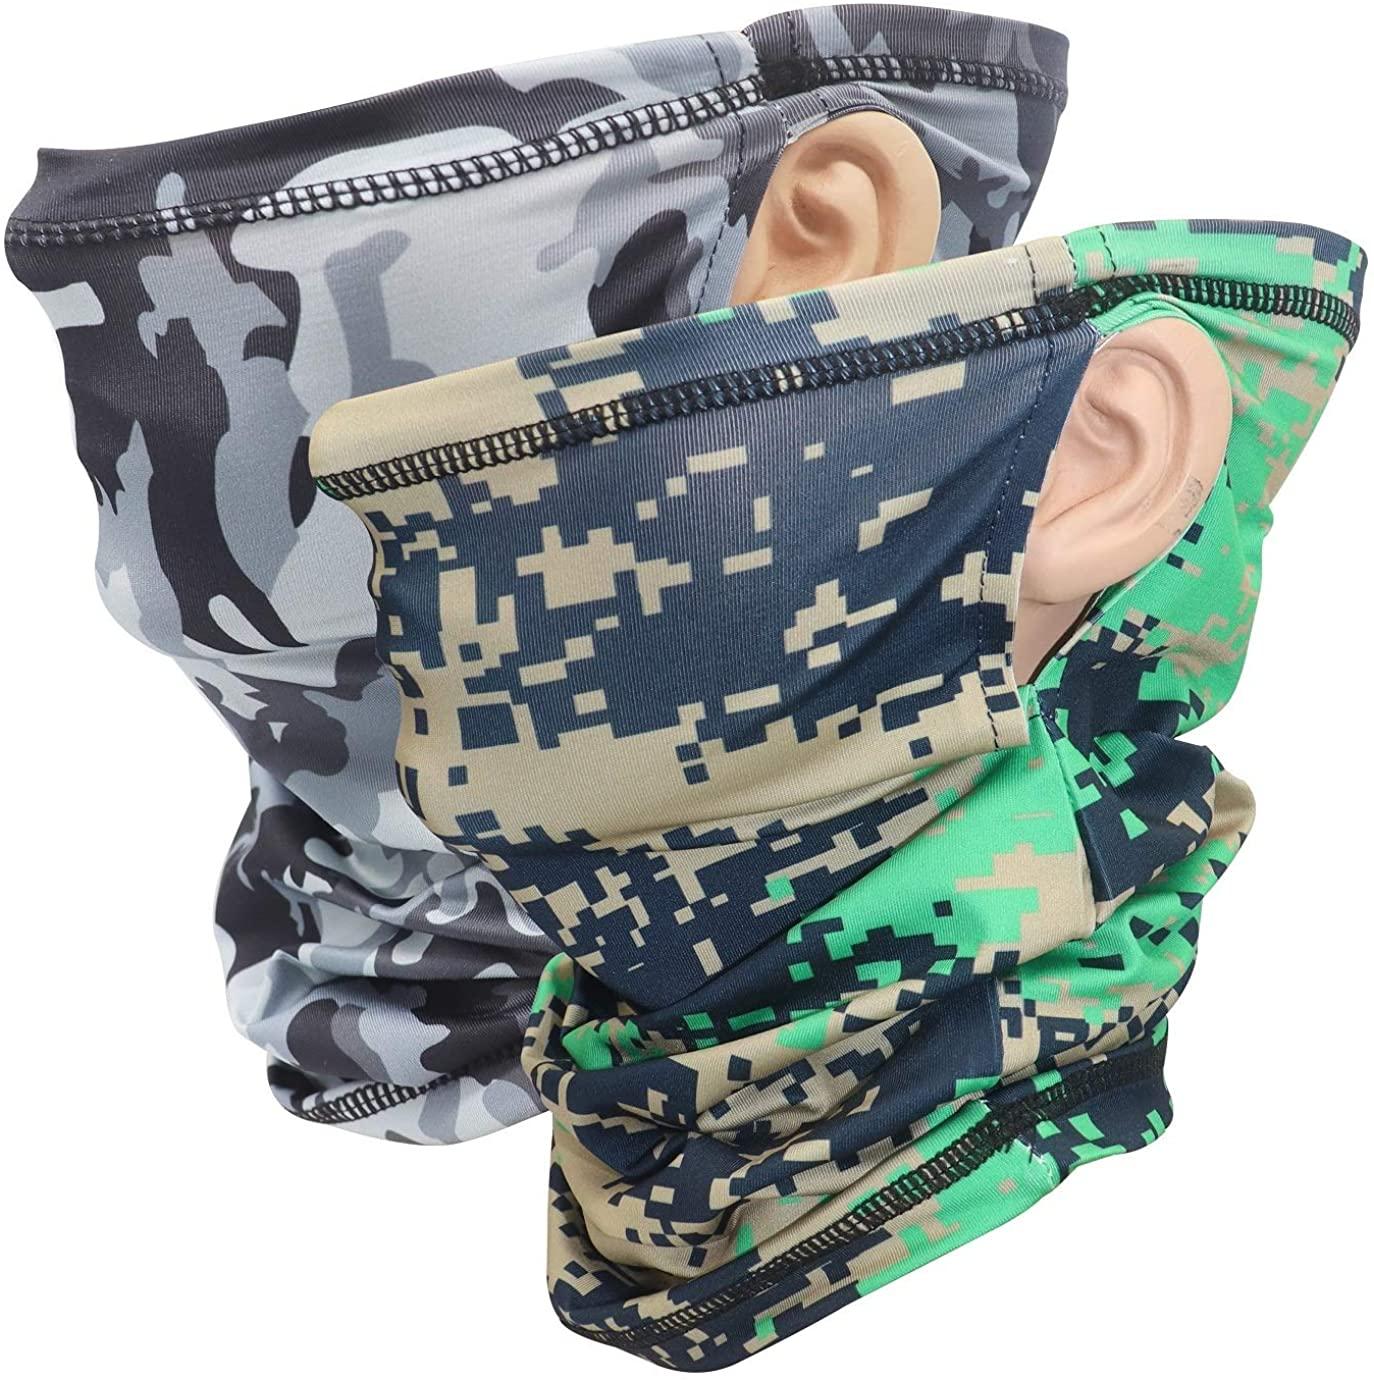 Attikee Breathable Neck Gaiter with Ear Loops, Sun UV Wind Dust Proof Face Scarf, Head wrap, Unisex Headband Balaclava